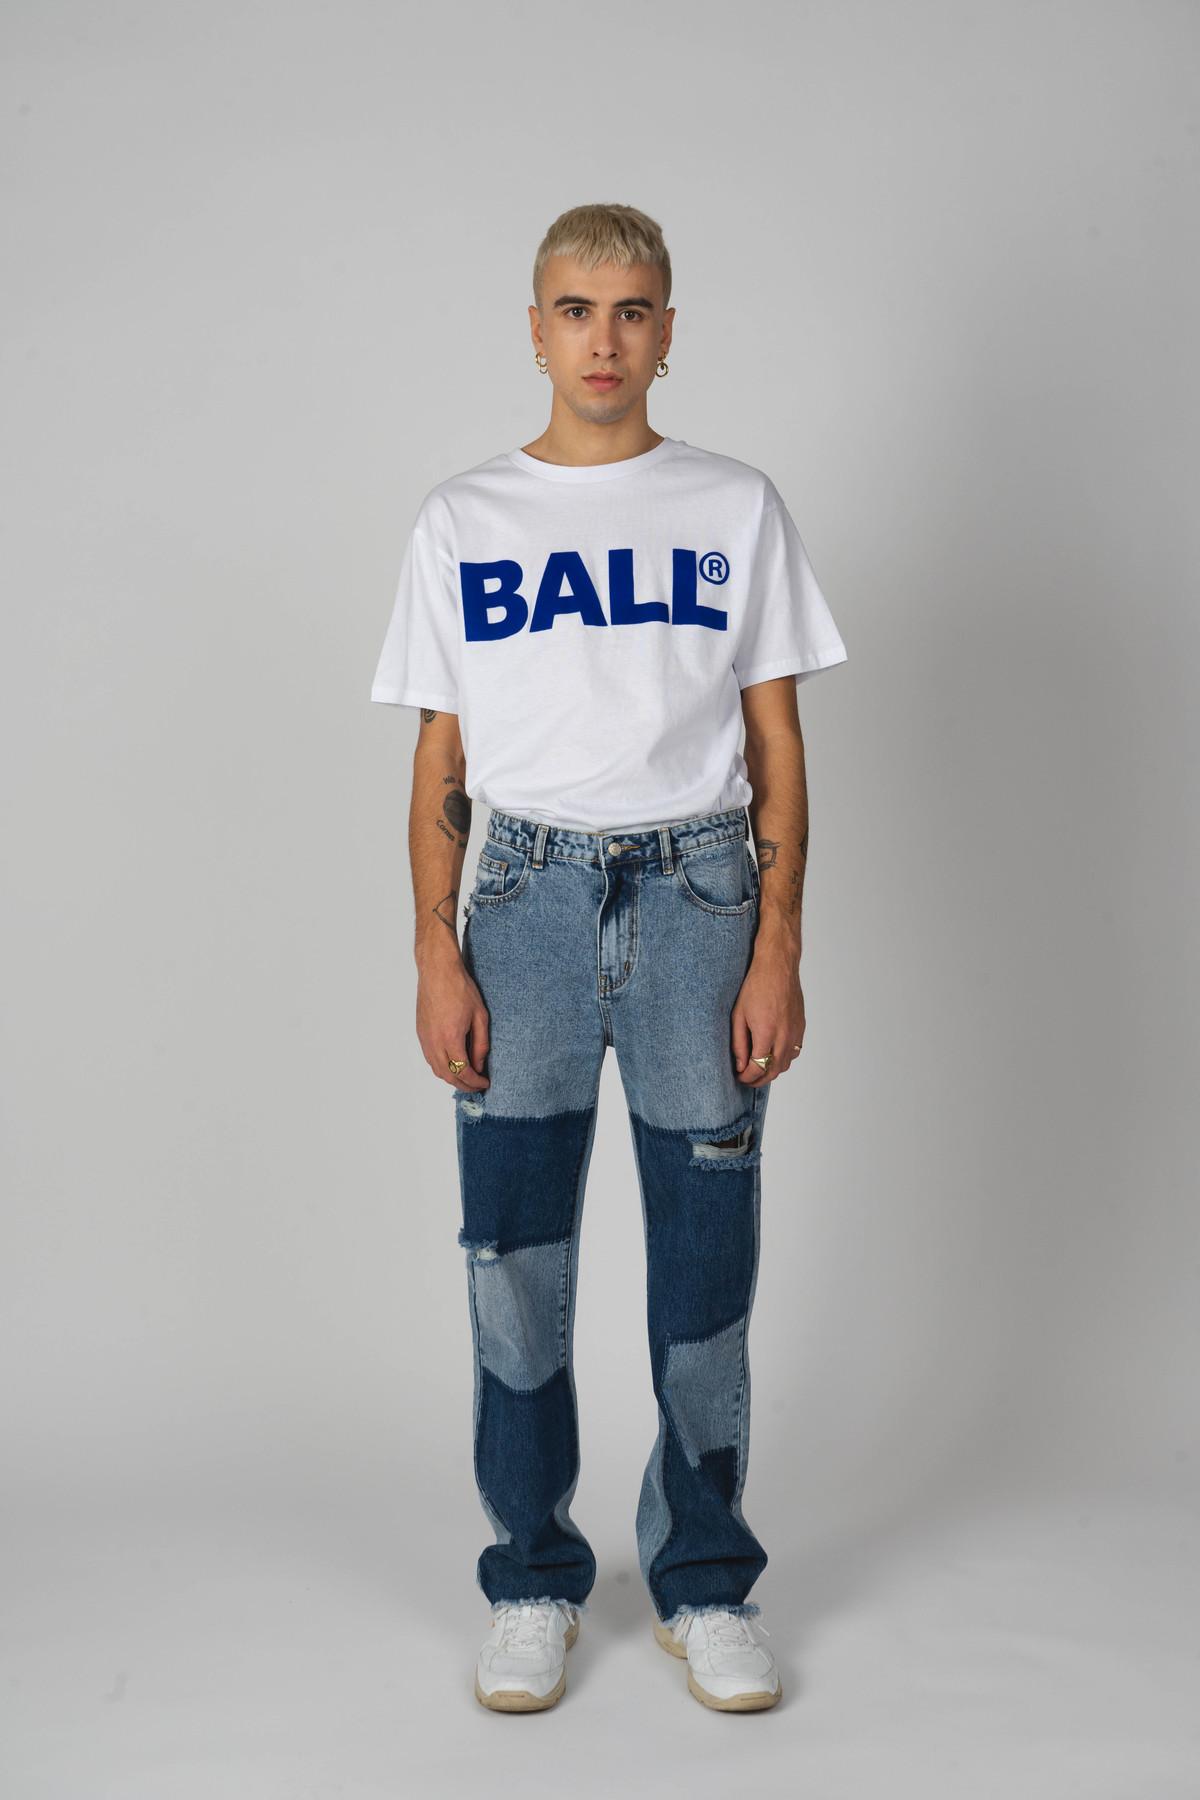 BALL Original CPH Flock t-shirt, optical white, XL